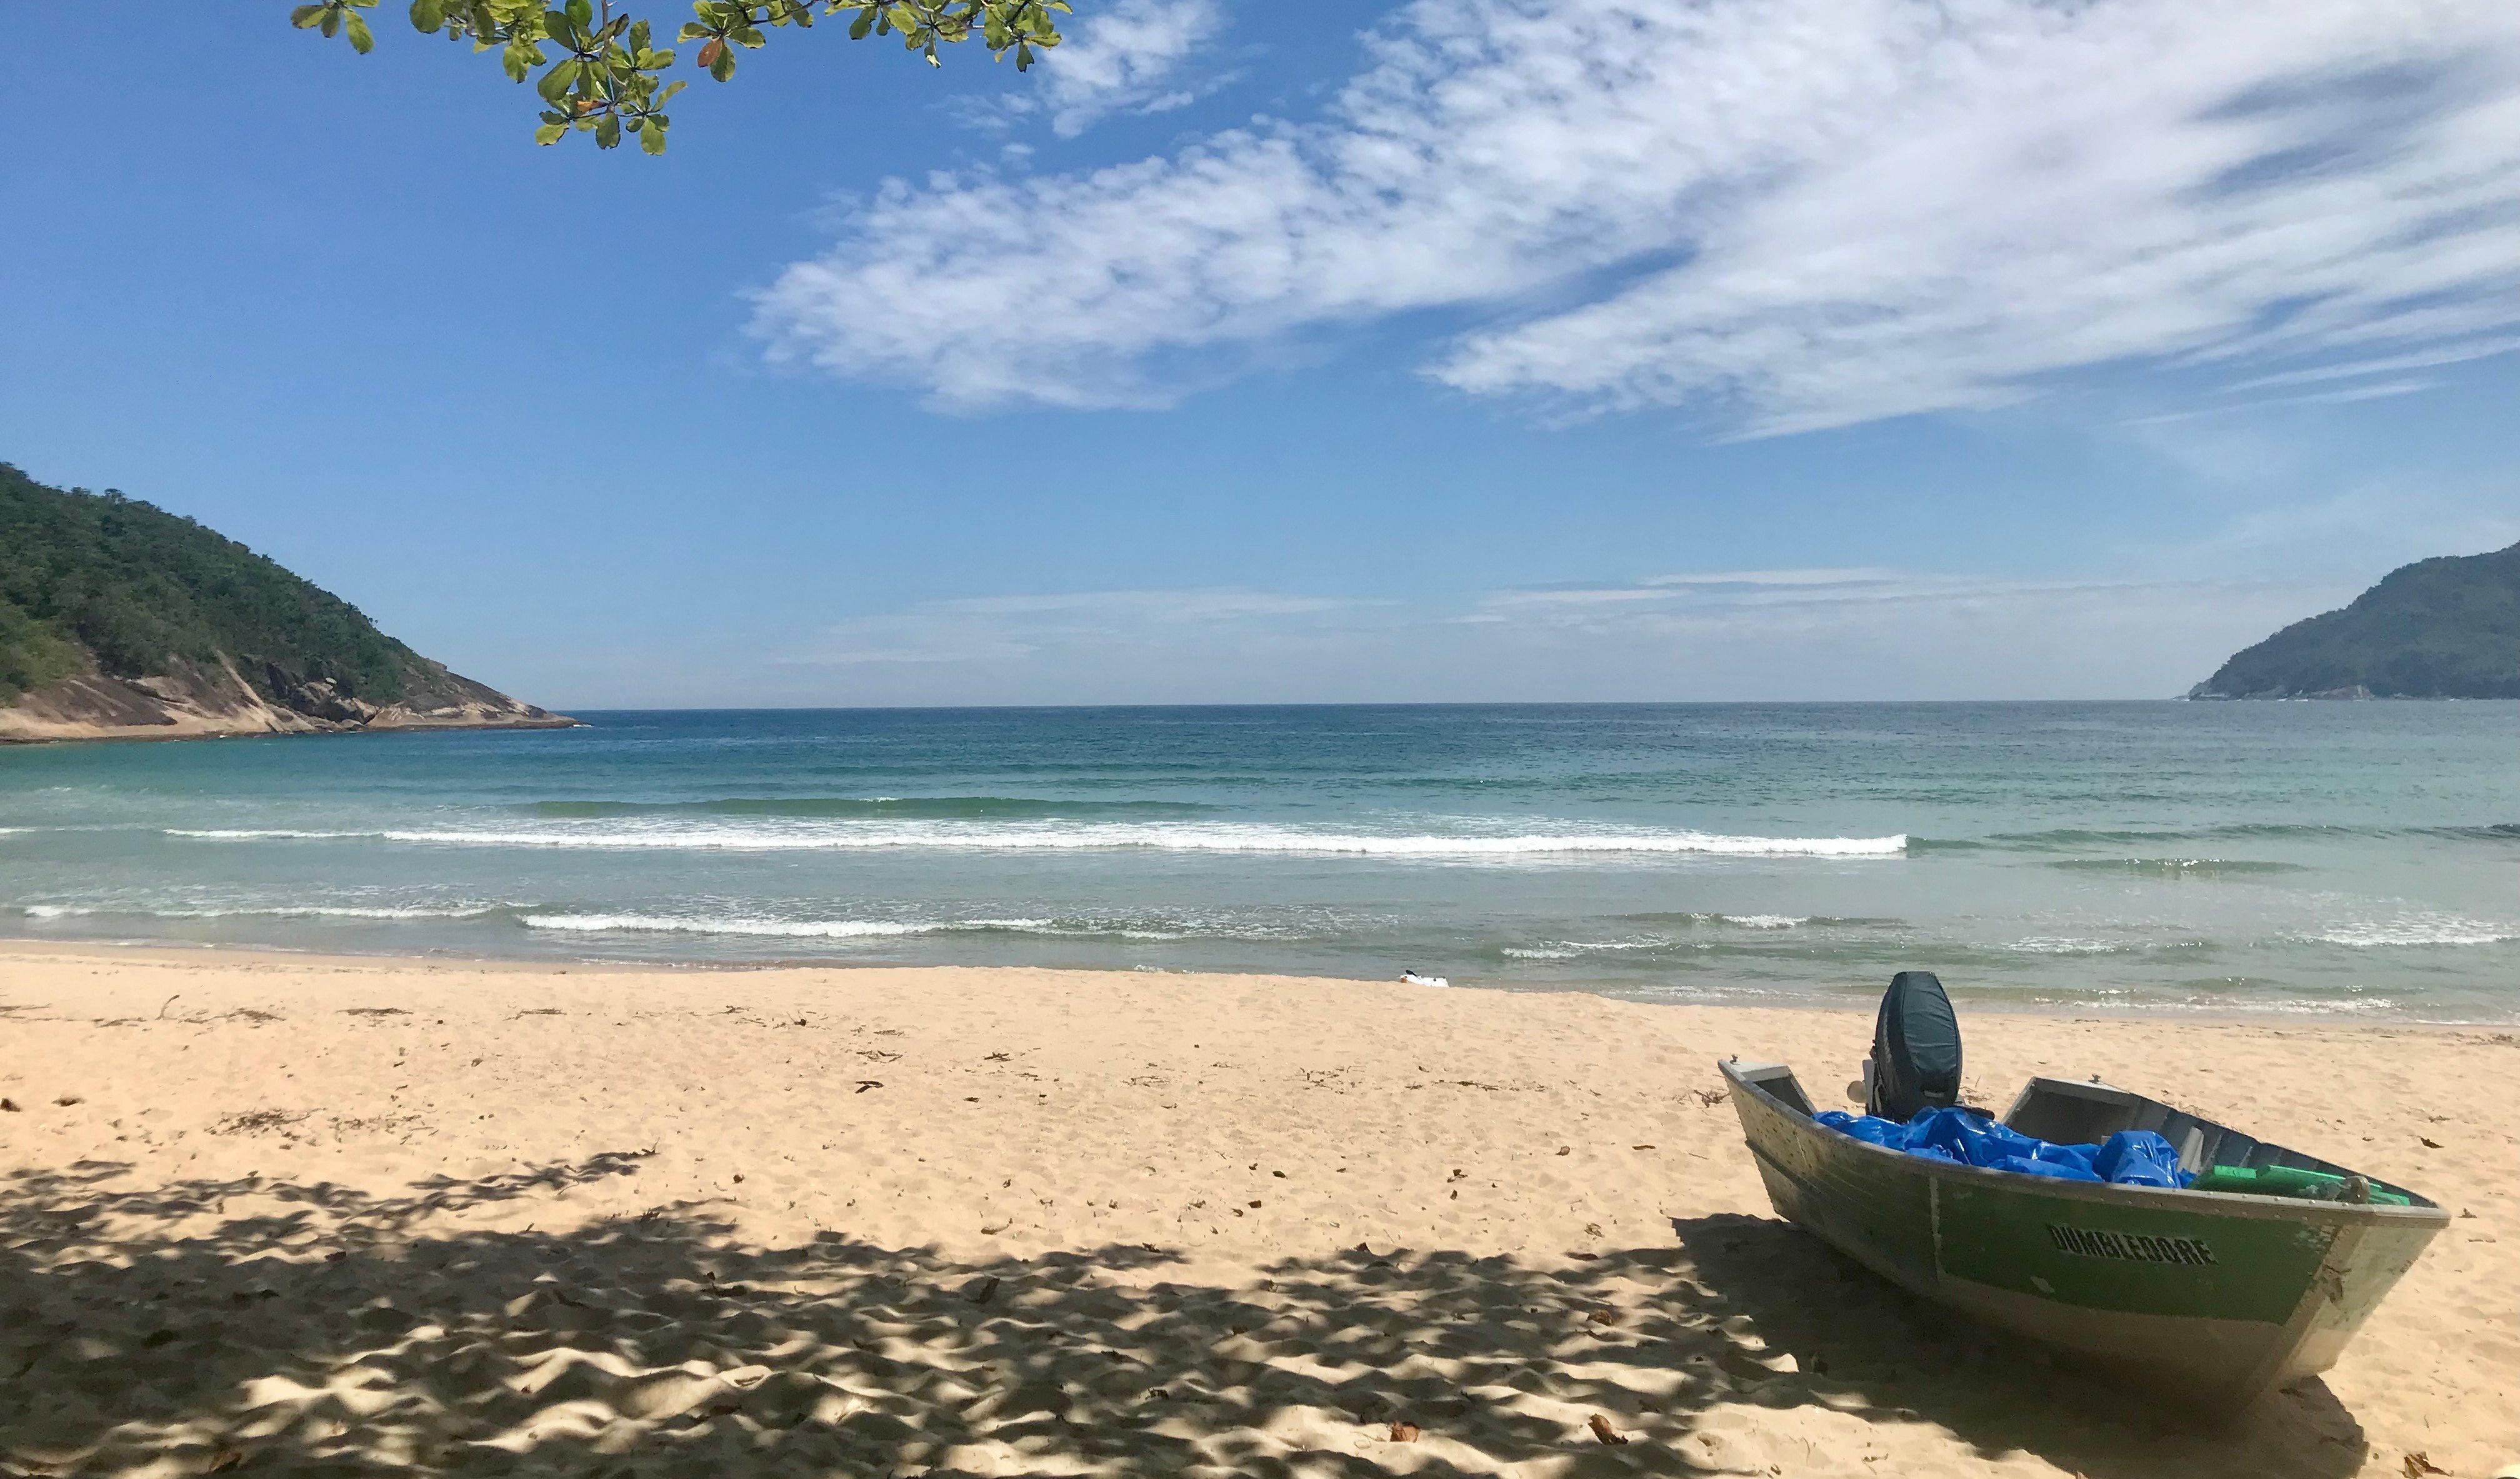 Praia Martim de Sá